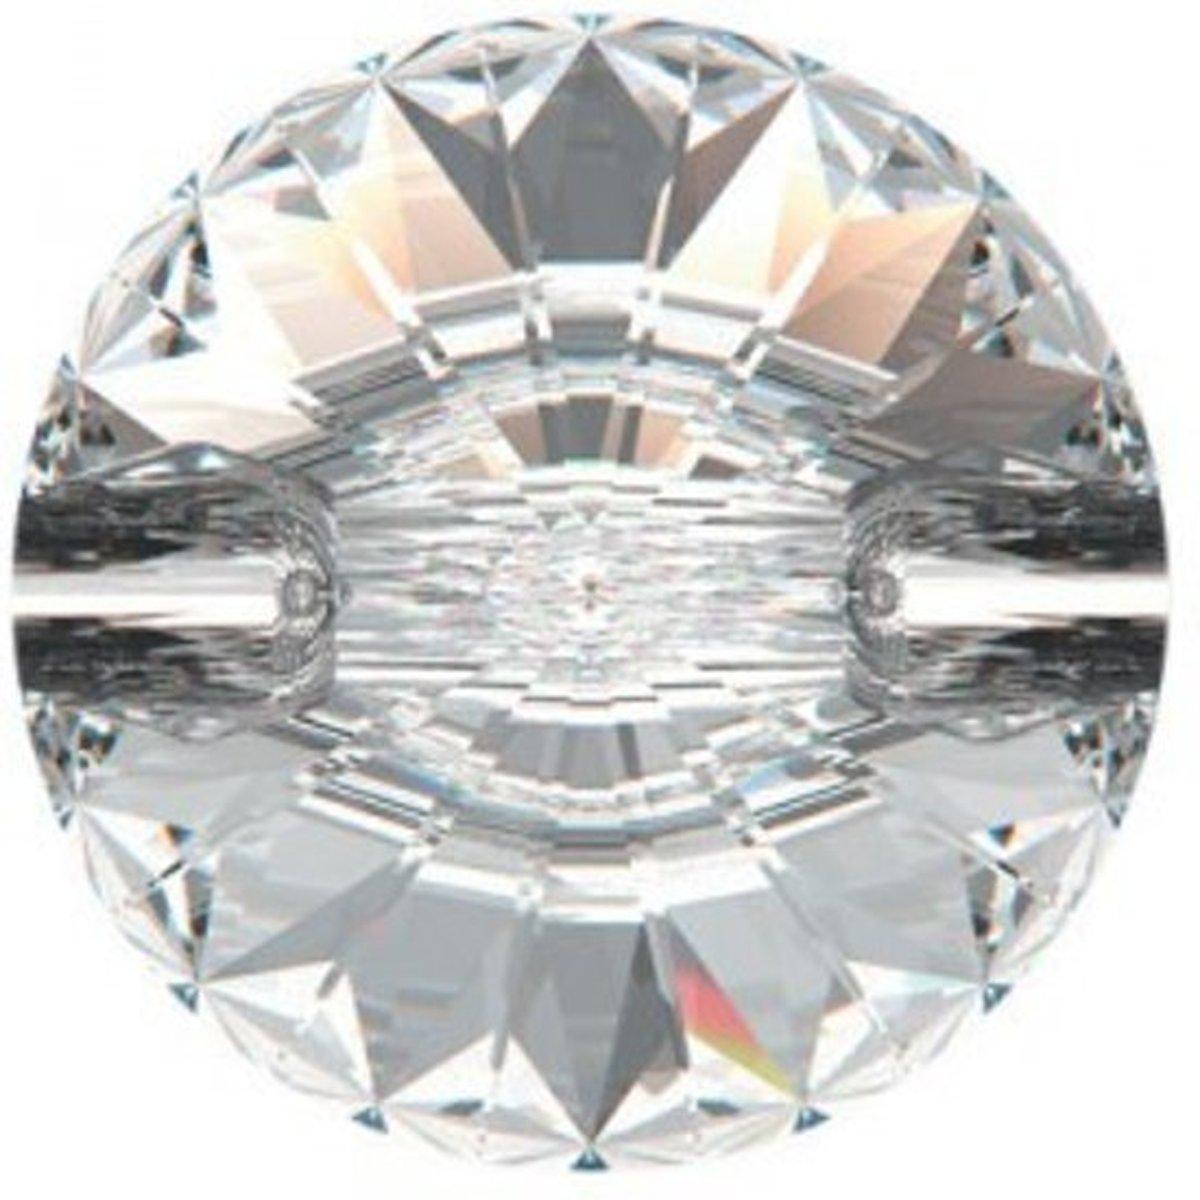 Swarovski knoop 18 mm per 6 stuks ( art. 3015 ) kopen